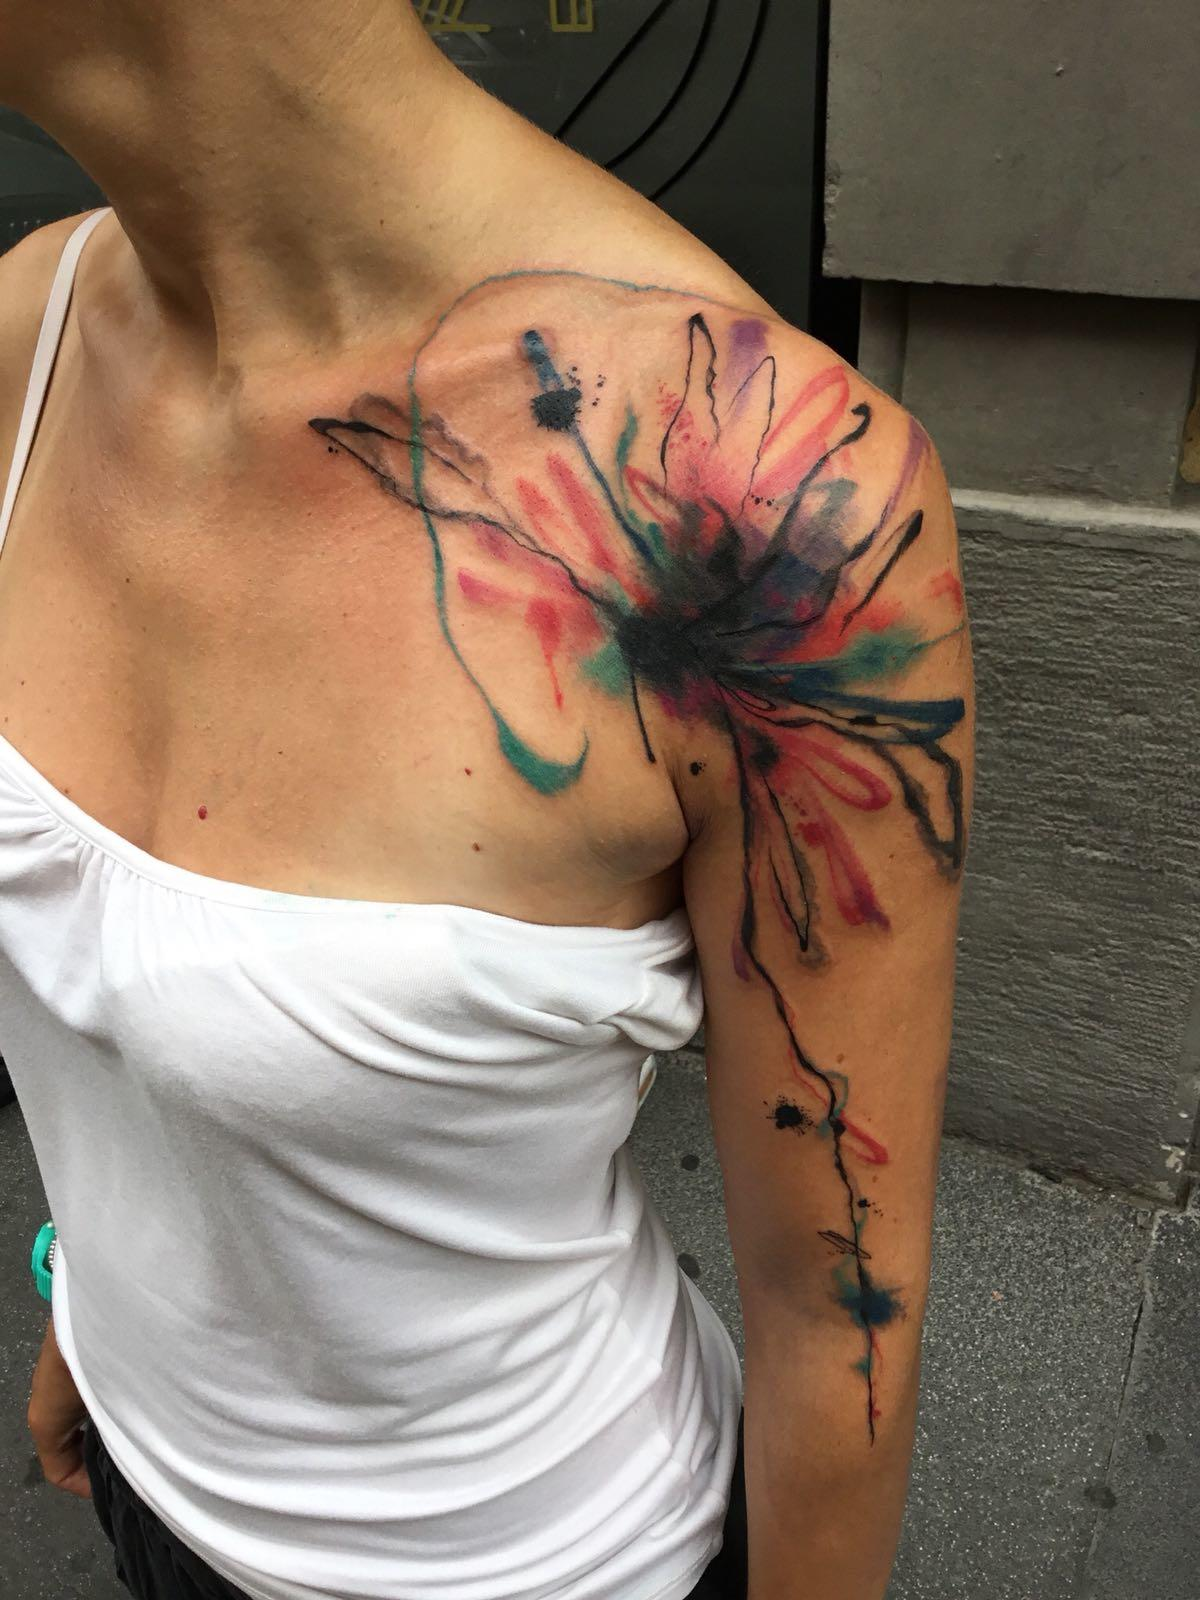 Ligera-Ink-tattoo-milano-tatuaggi-milano-migliori-tatuatori-milano-tatuaggio-watercolor-tatuaggio-acquerello-tattoo-watercolor-tatuaggio-astratto